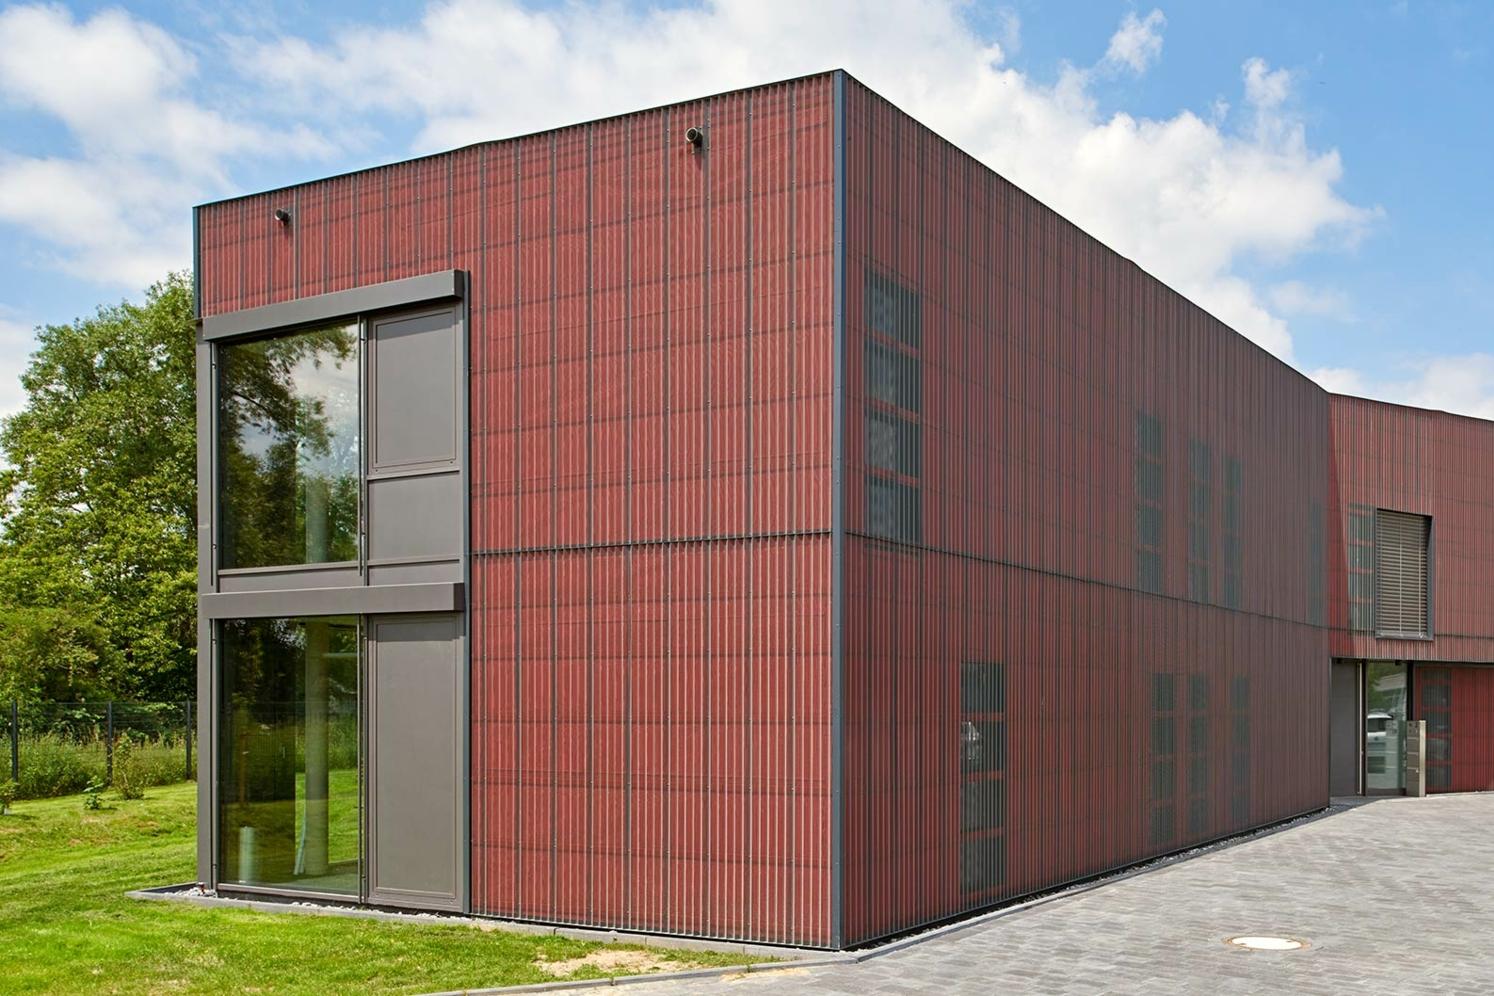 DELTA®-FASSADE COLOR rood op een kantoorgebouw in Hamm, Duitsland